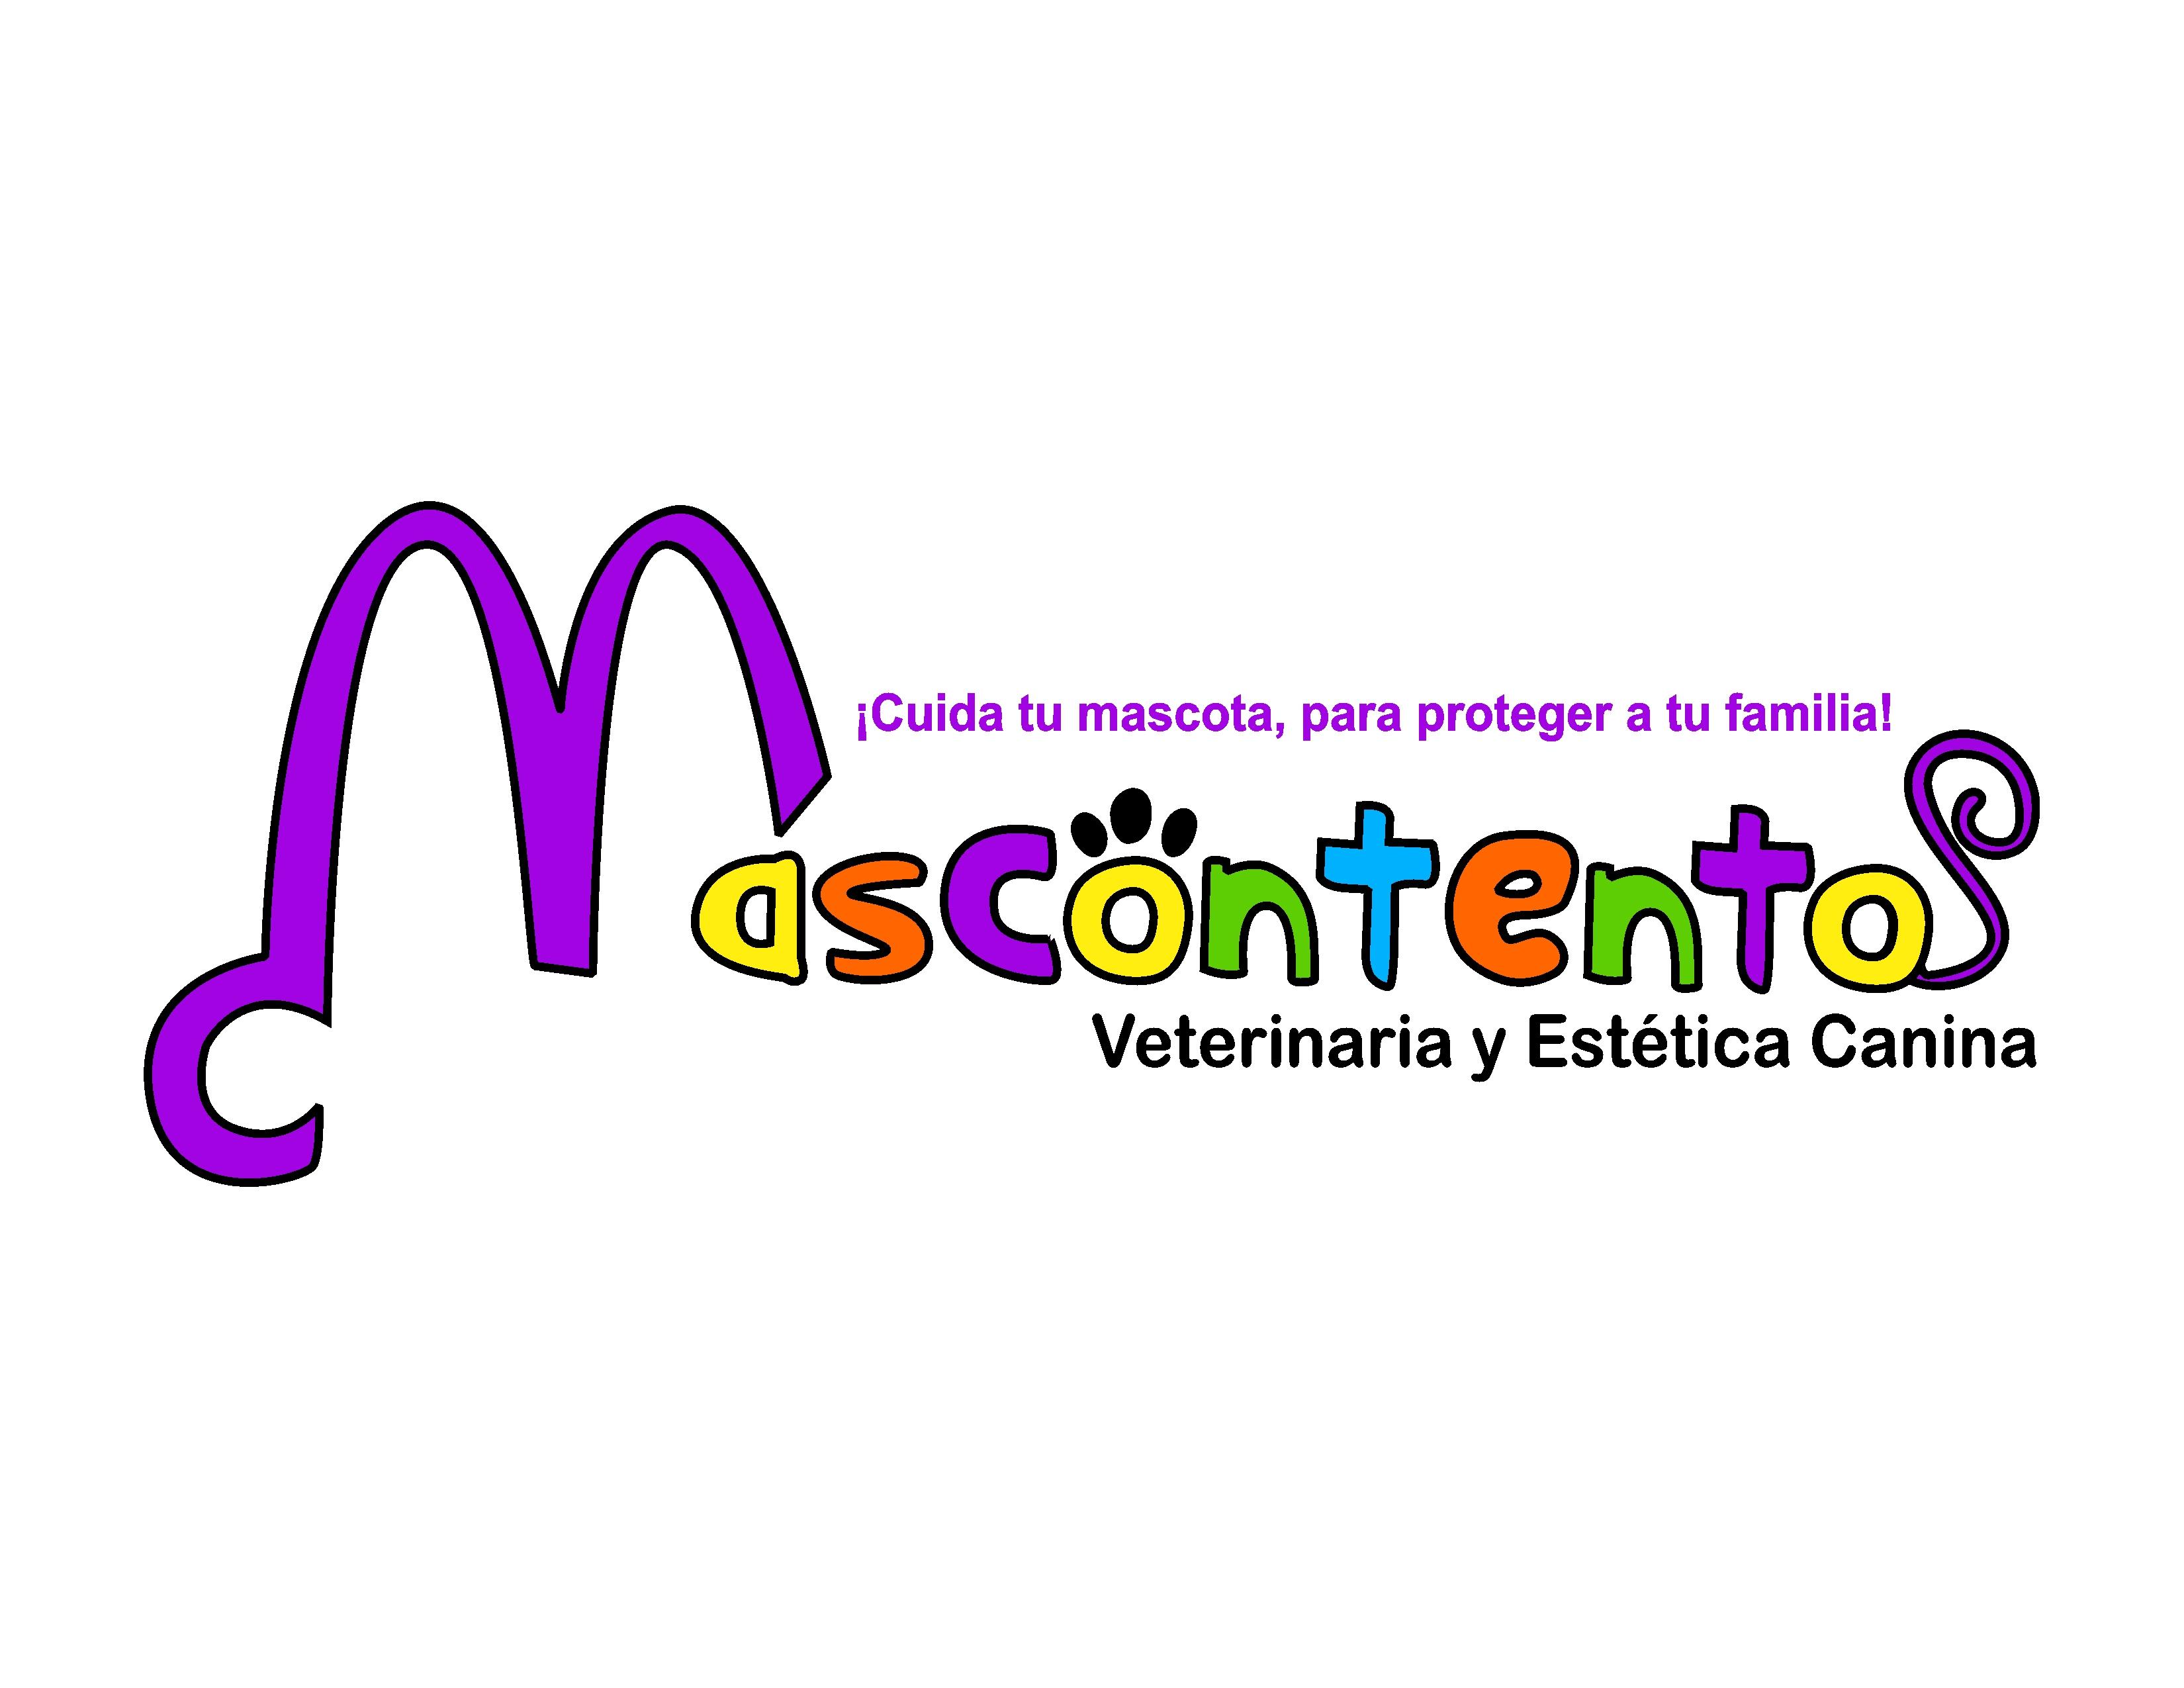 Mascontentos veterinaria